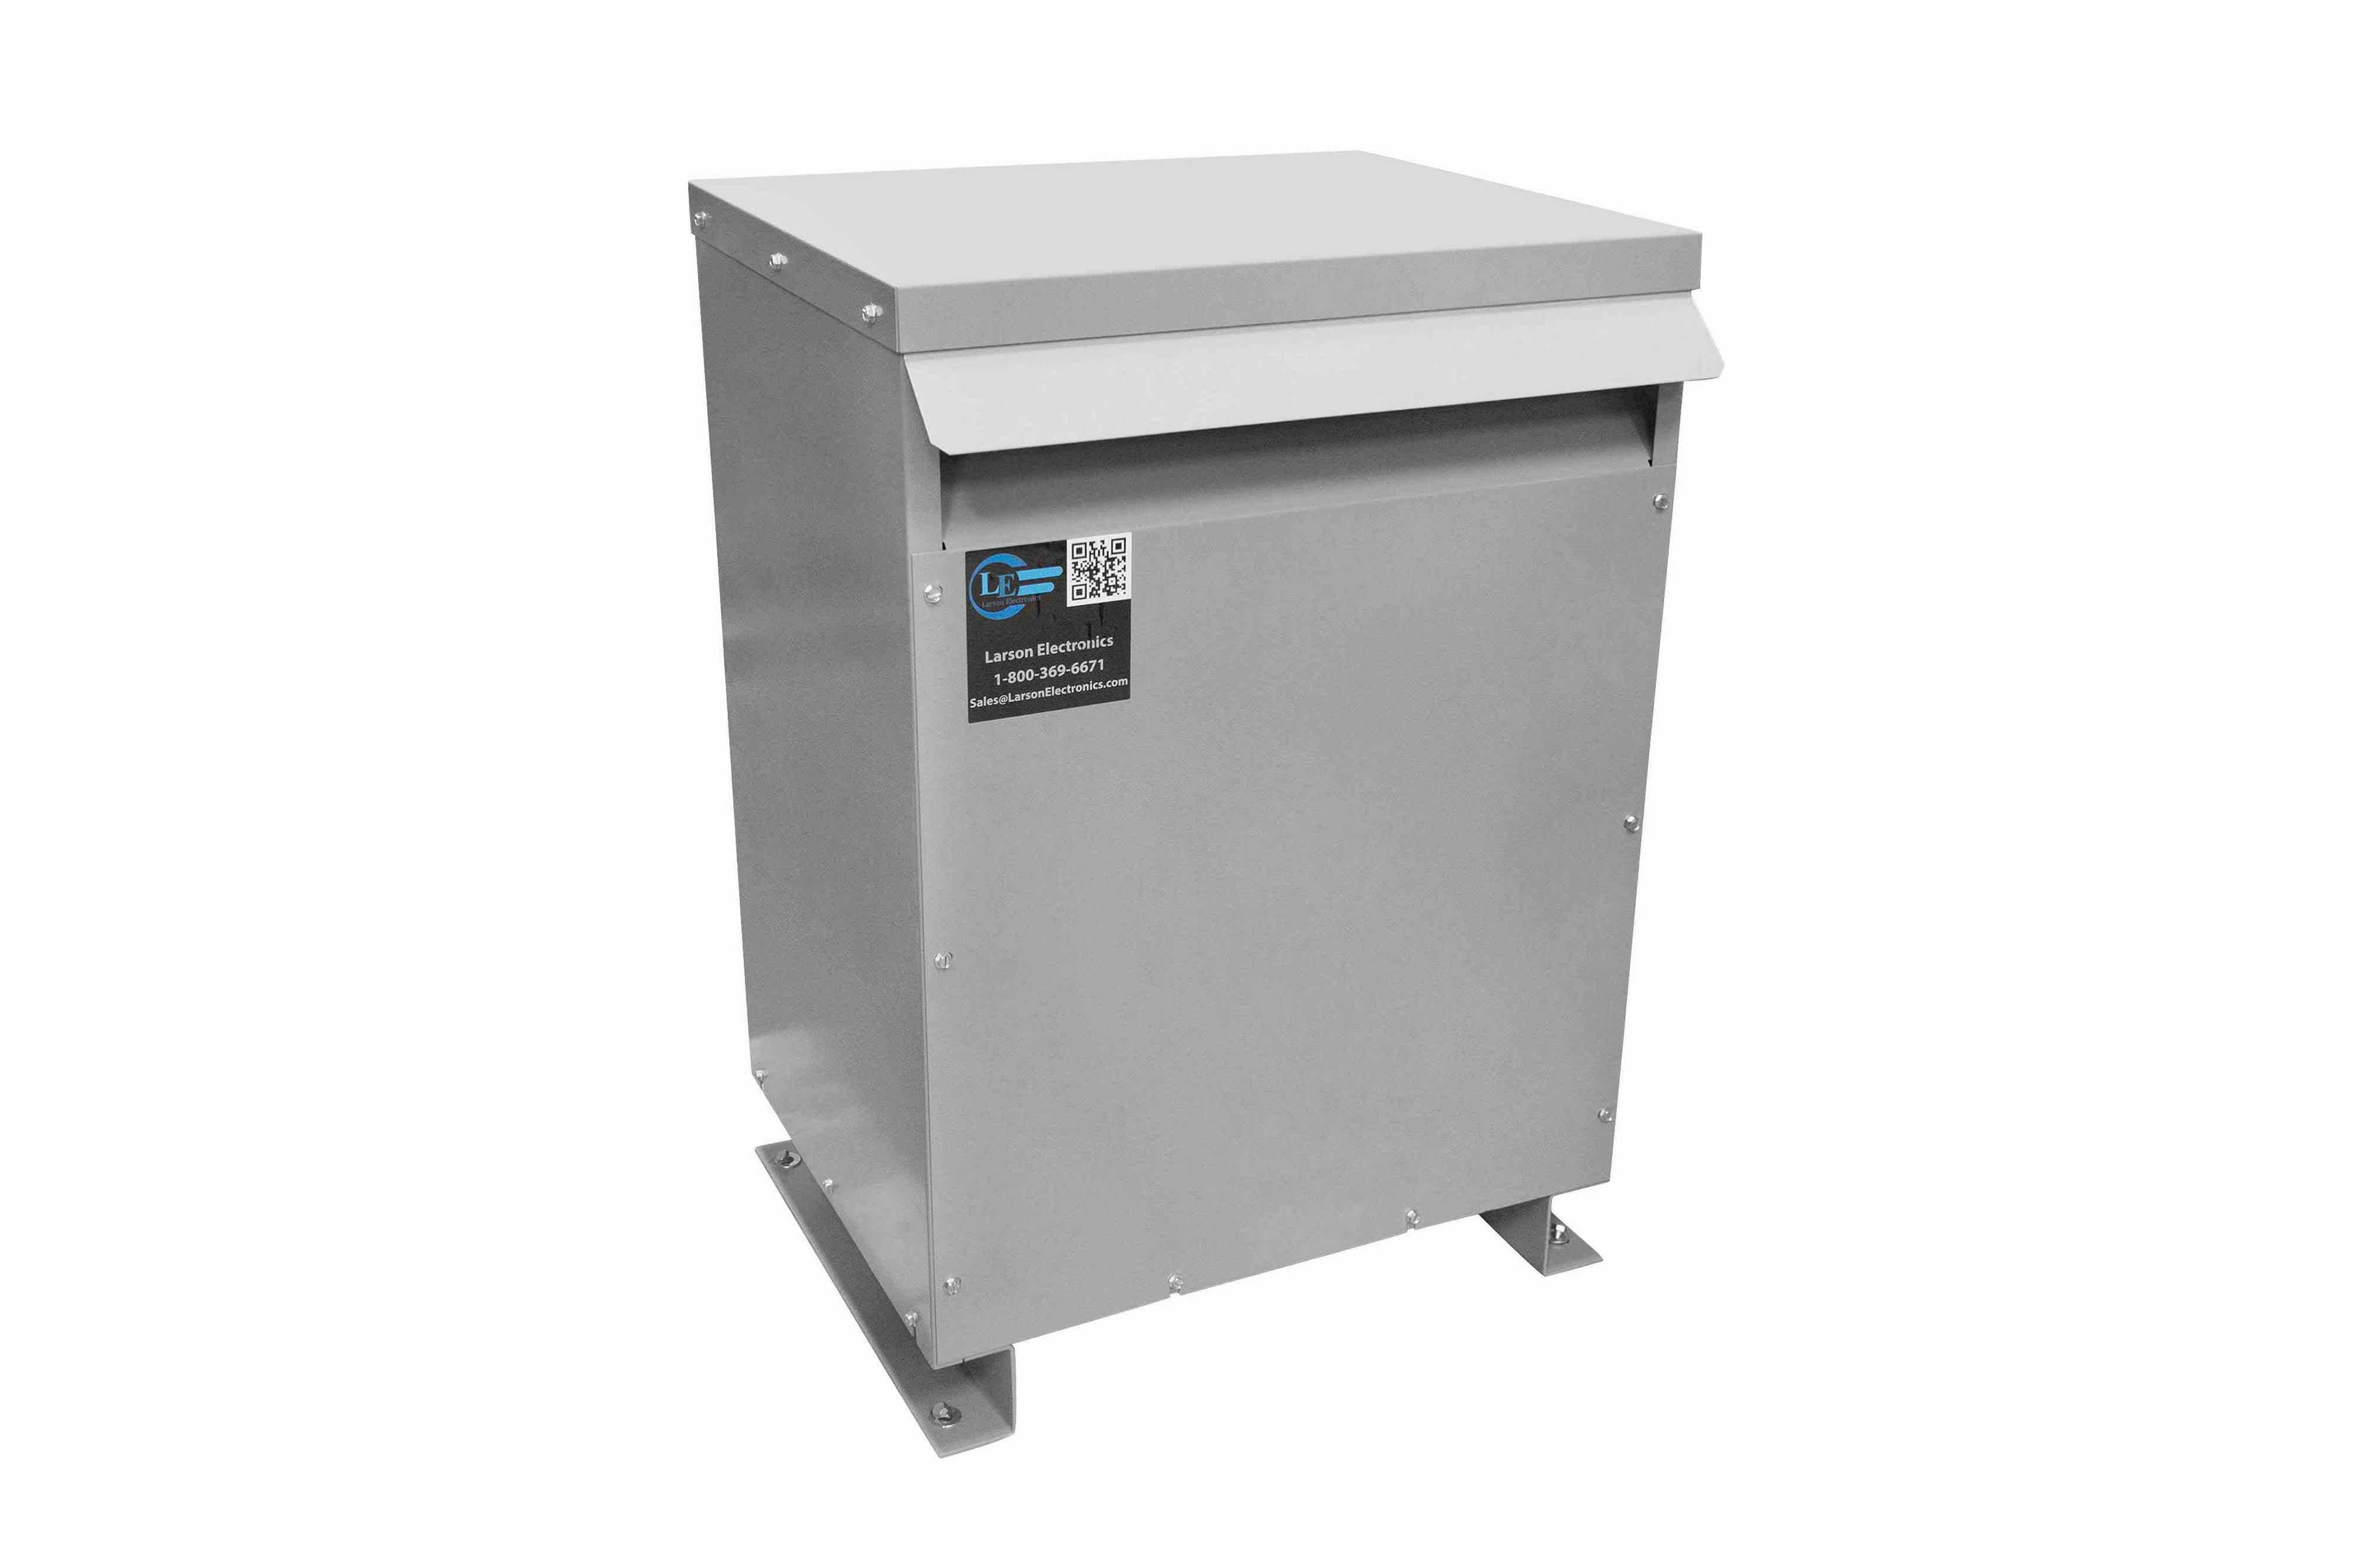 65 kVA 3PH Isolation Transformer, 480V Wye Primary, 380V Delta Secondary, N3R, Ventilated, 60 Hz